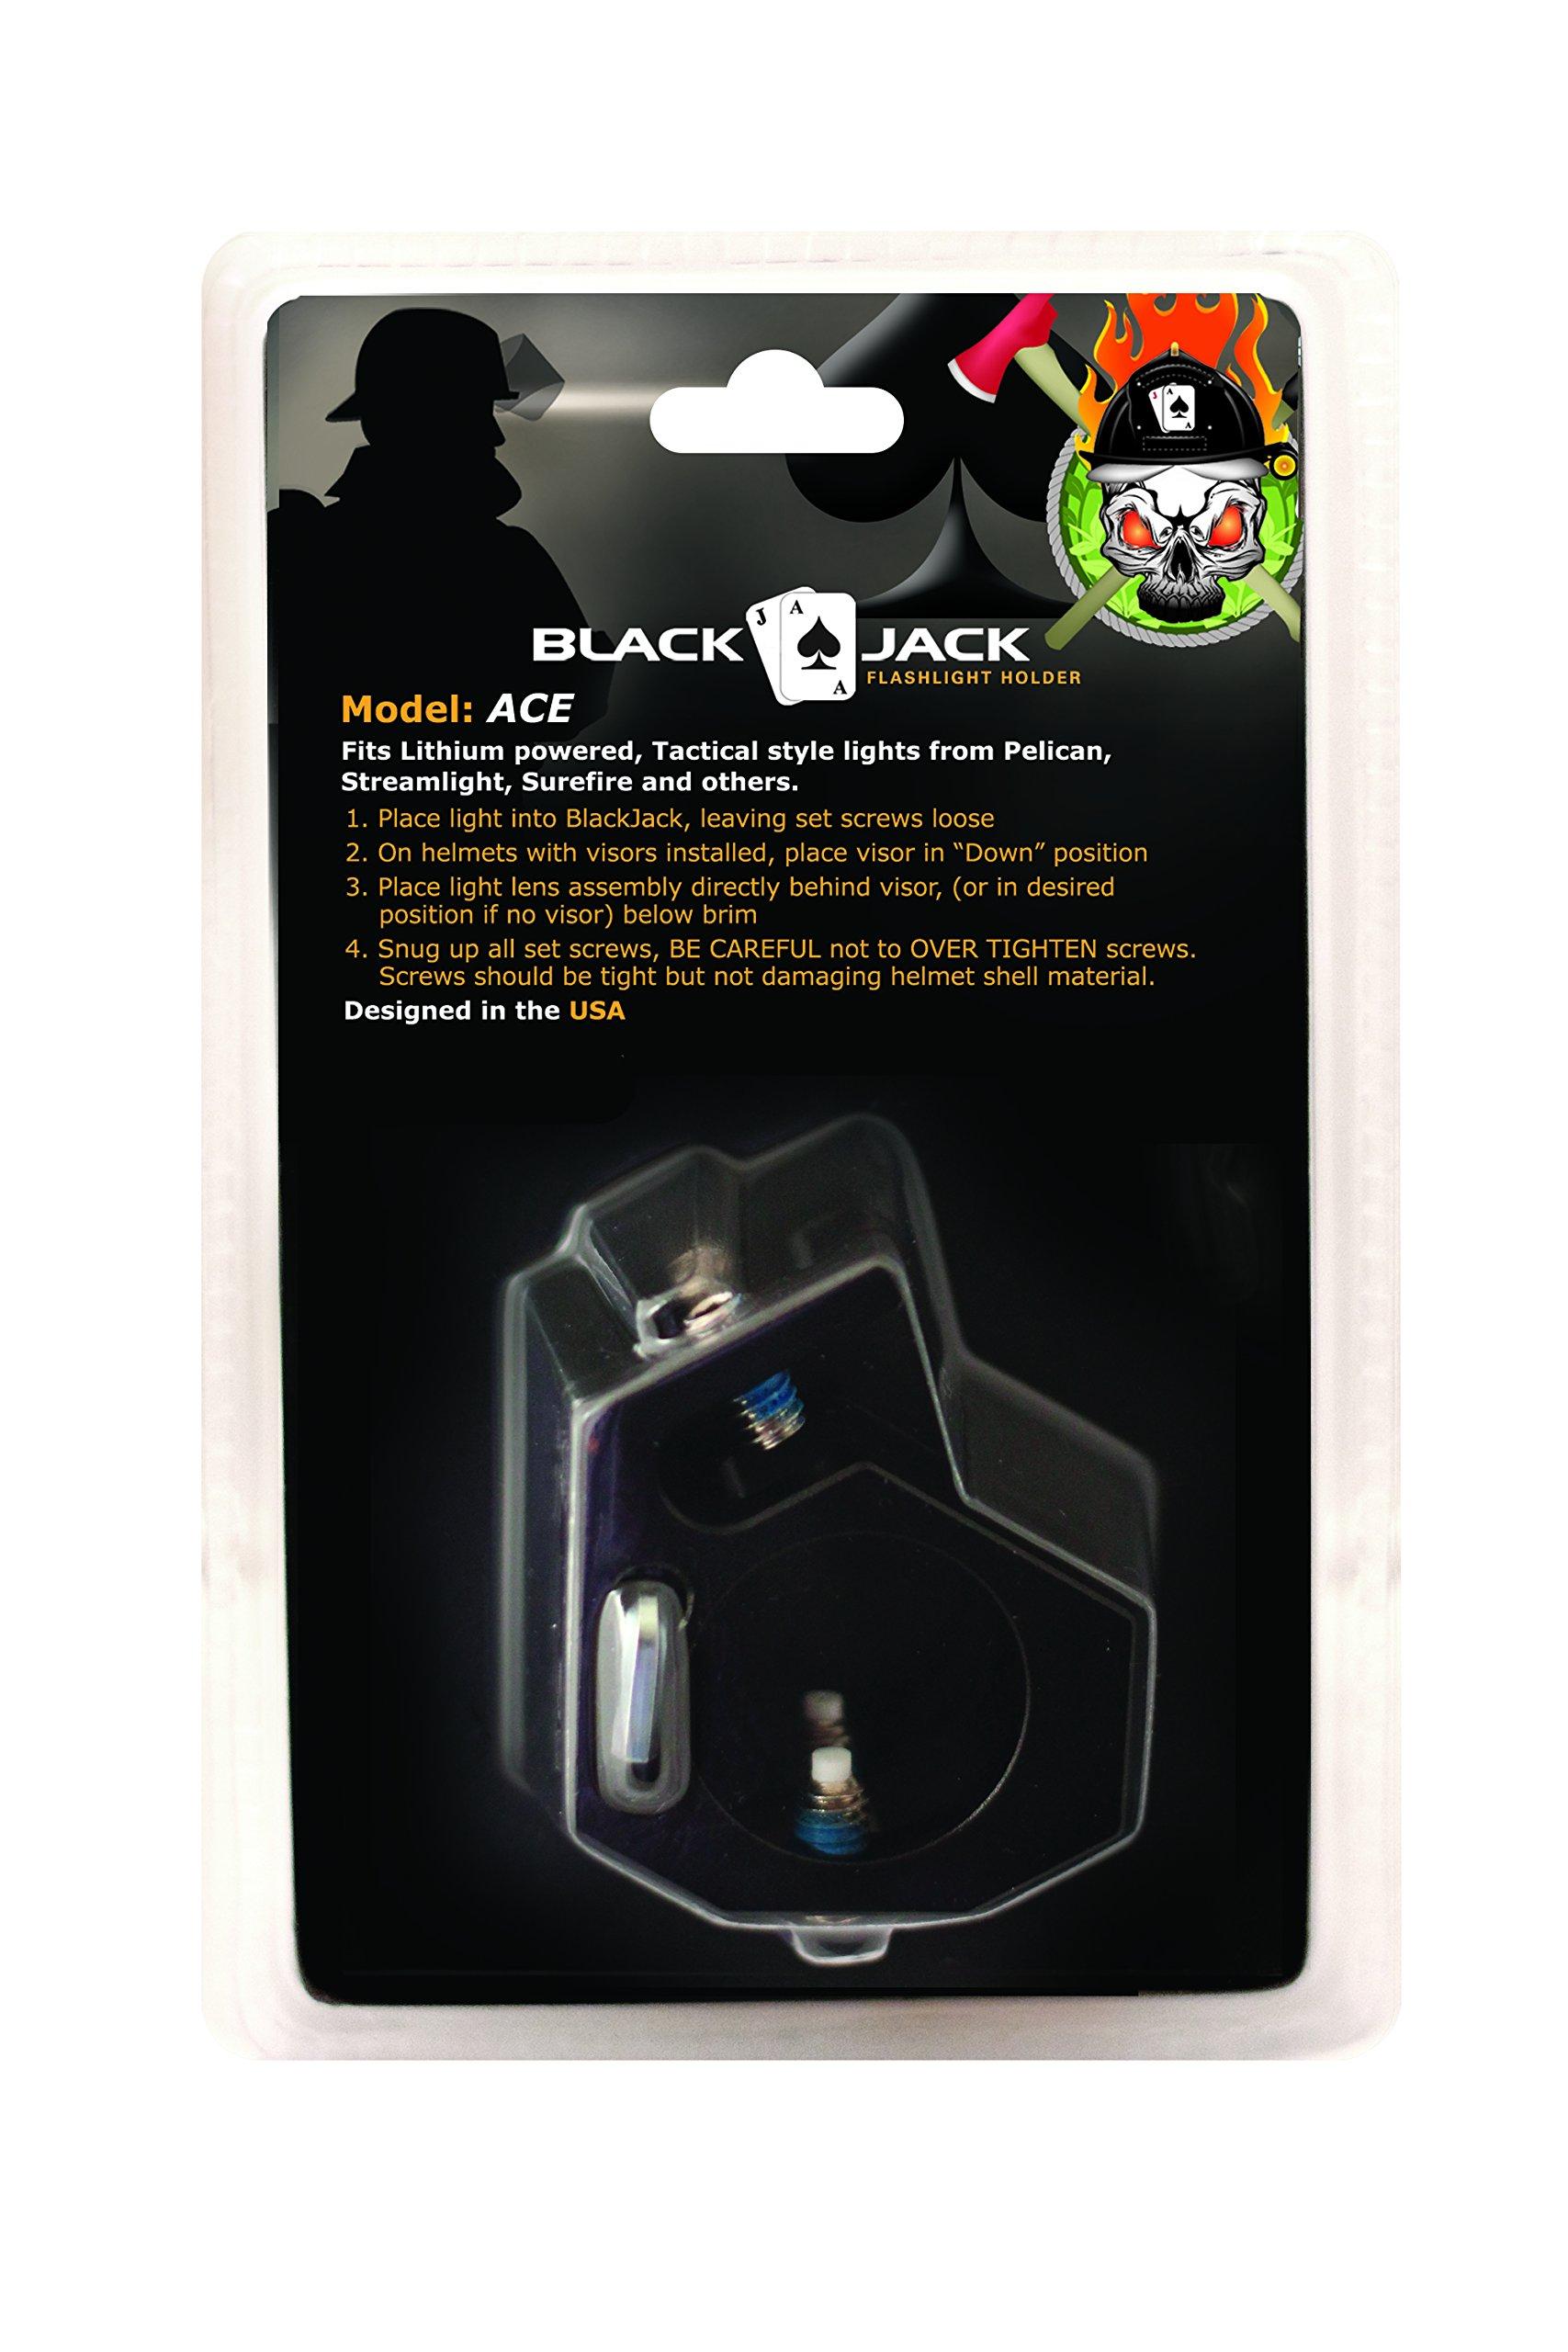 Blackjack ACE Firefighter Helmet Aluminum Flashlight Holder by Blackjack Fire & Safety (Image #2)